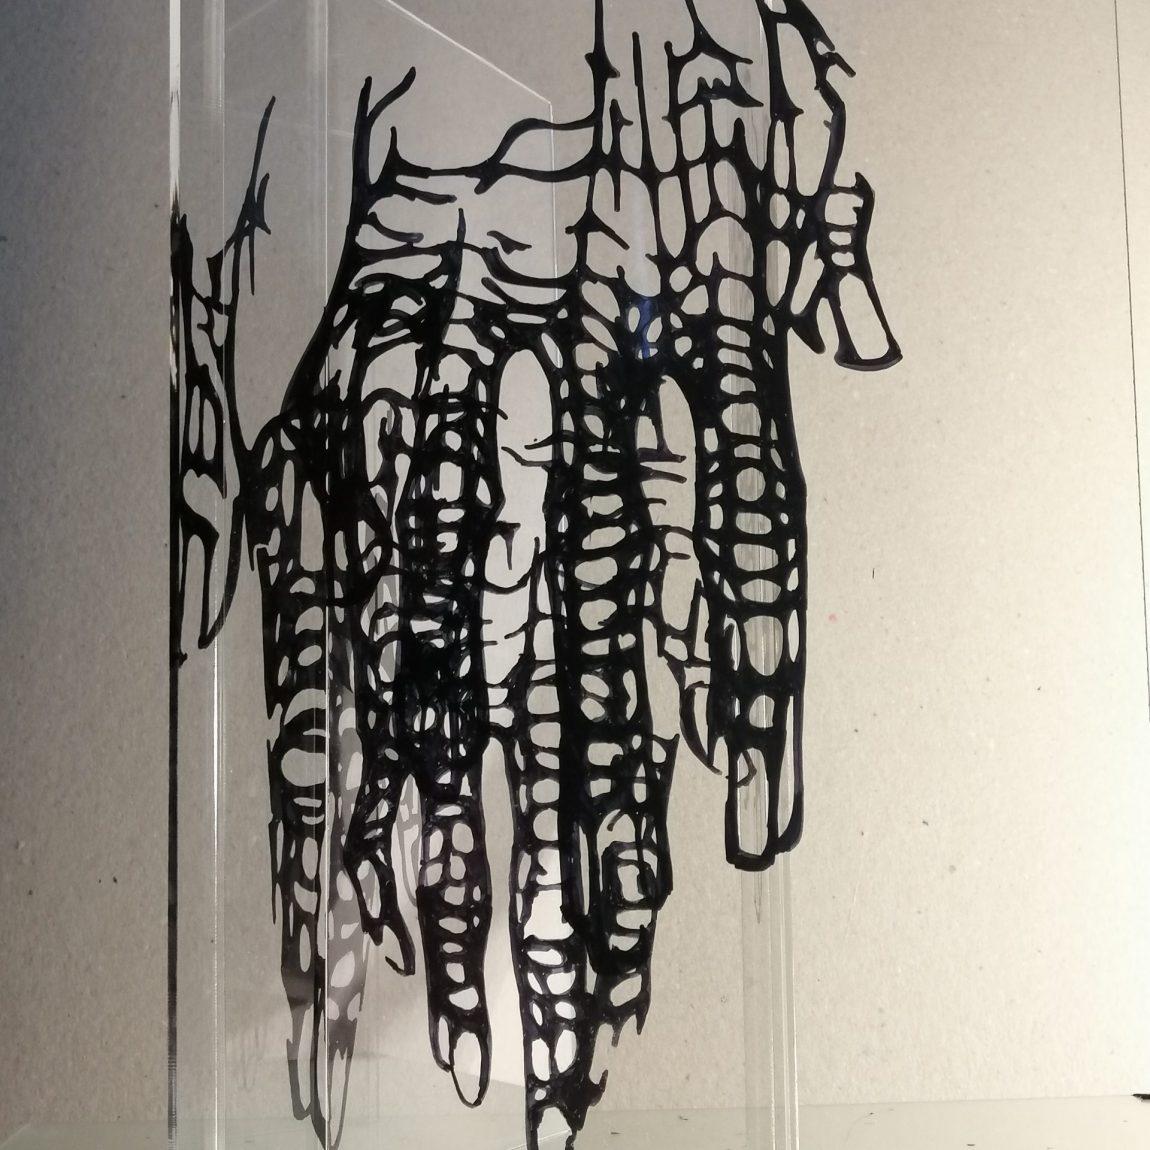 Neslihan Pala Teknik: Pleksiglas üzerine çizim Boyut:30x20x20cm Fiyat:7.080 TL